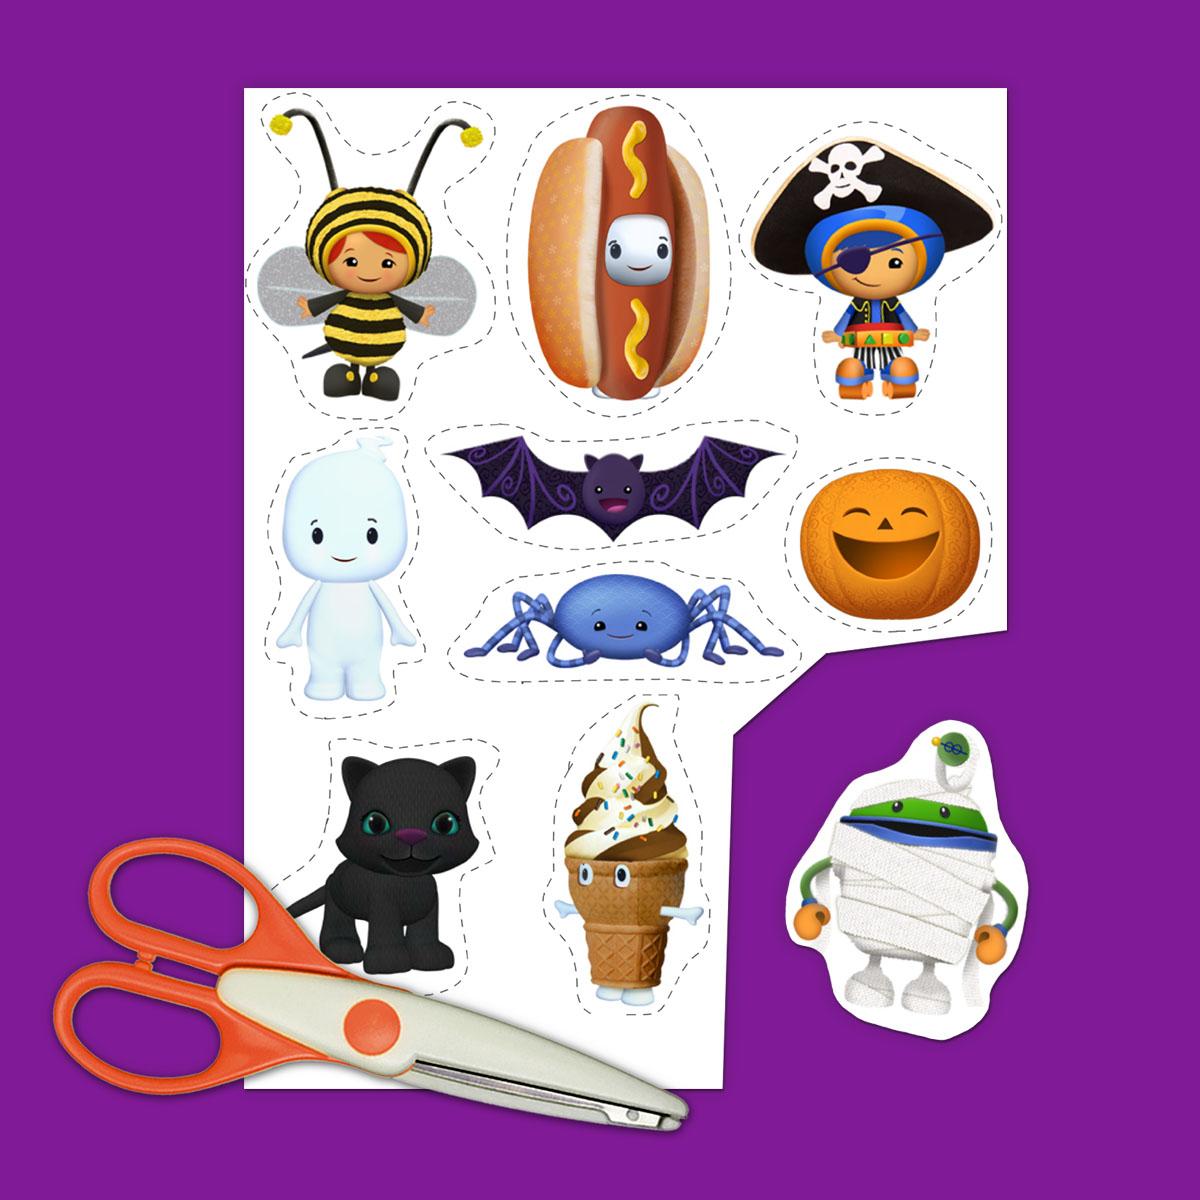 4 Team Umizoomi Halloween Printables